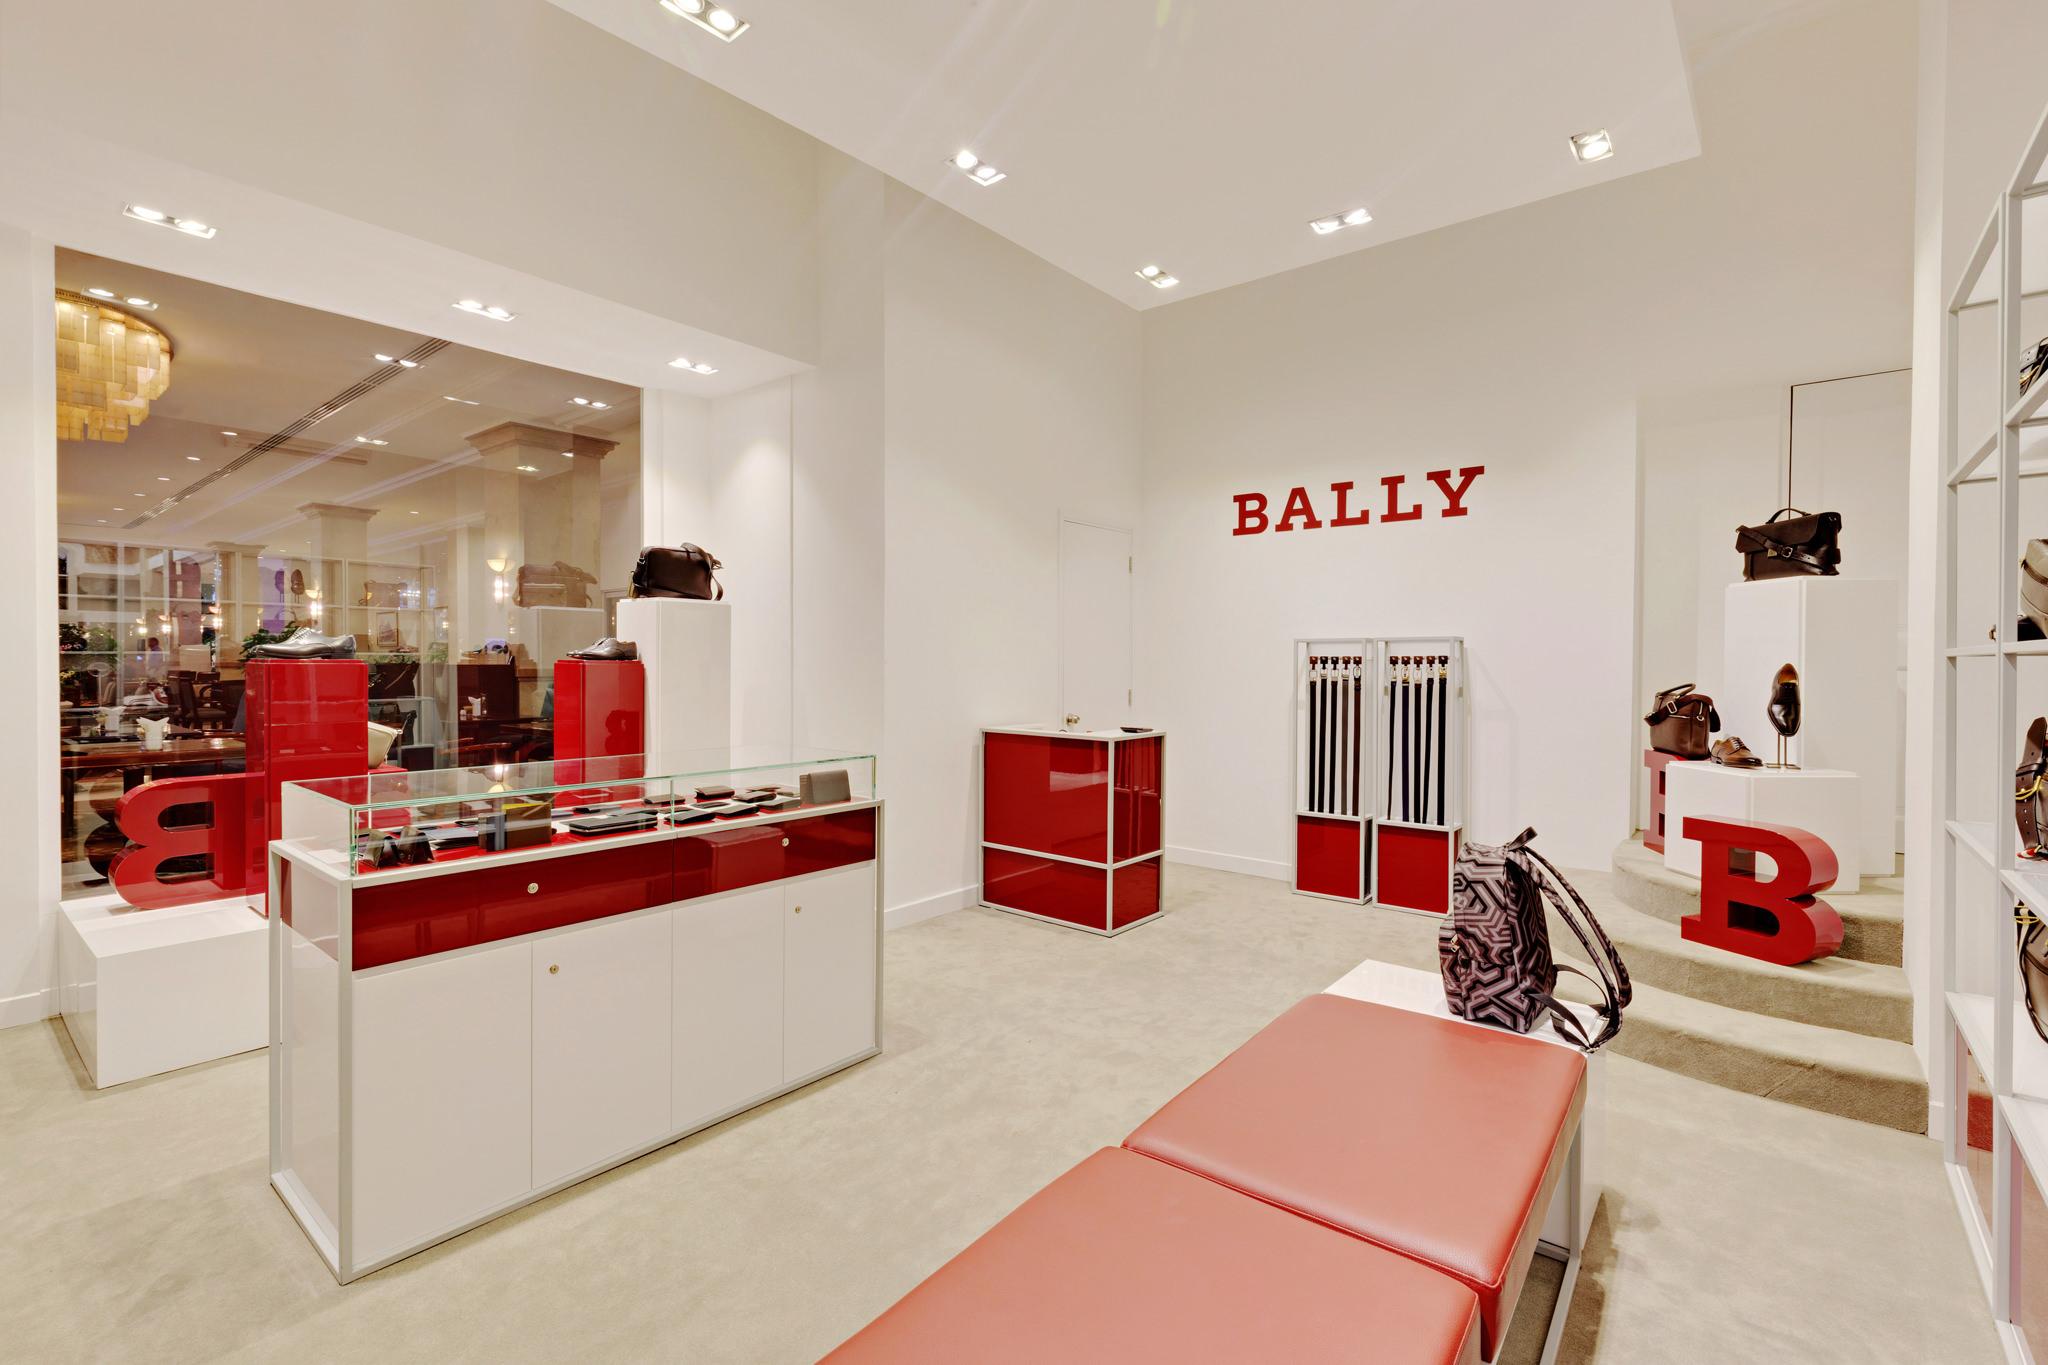 20170316 - Bally - HCM - Commercial - Interior - Store - Retouch 0010.jpg